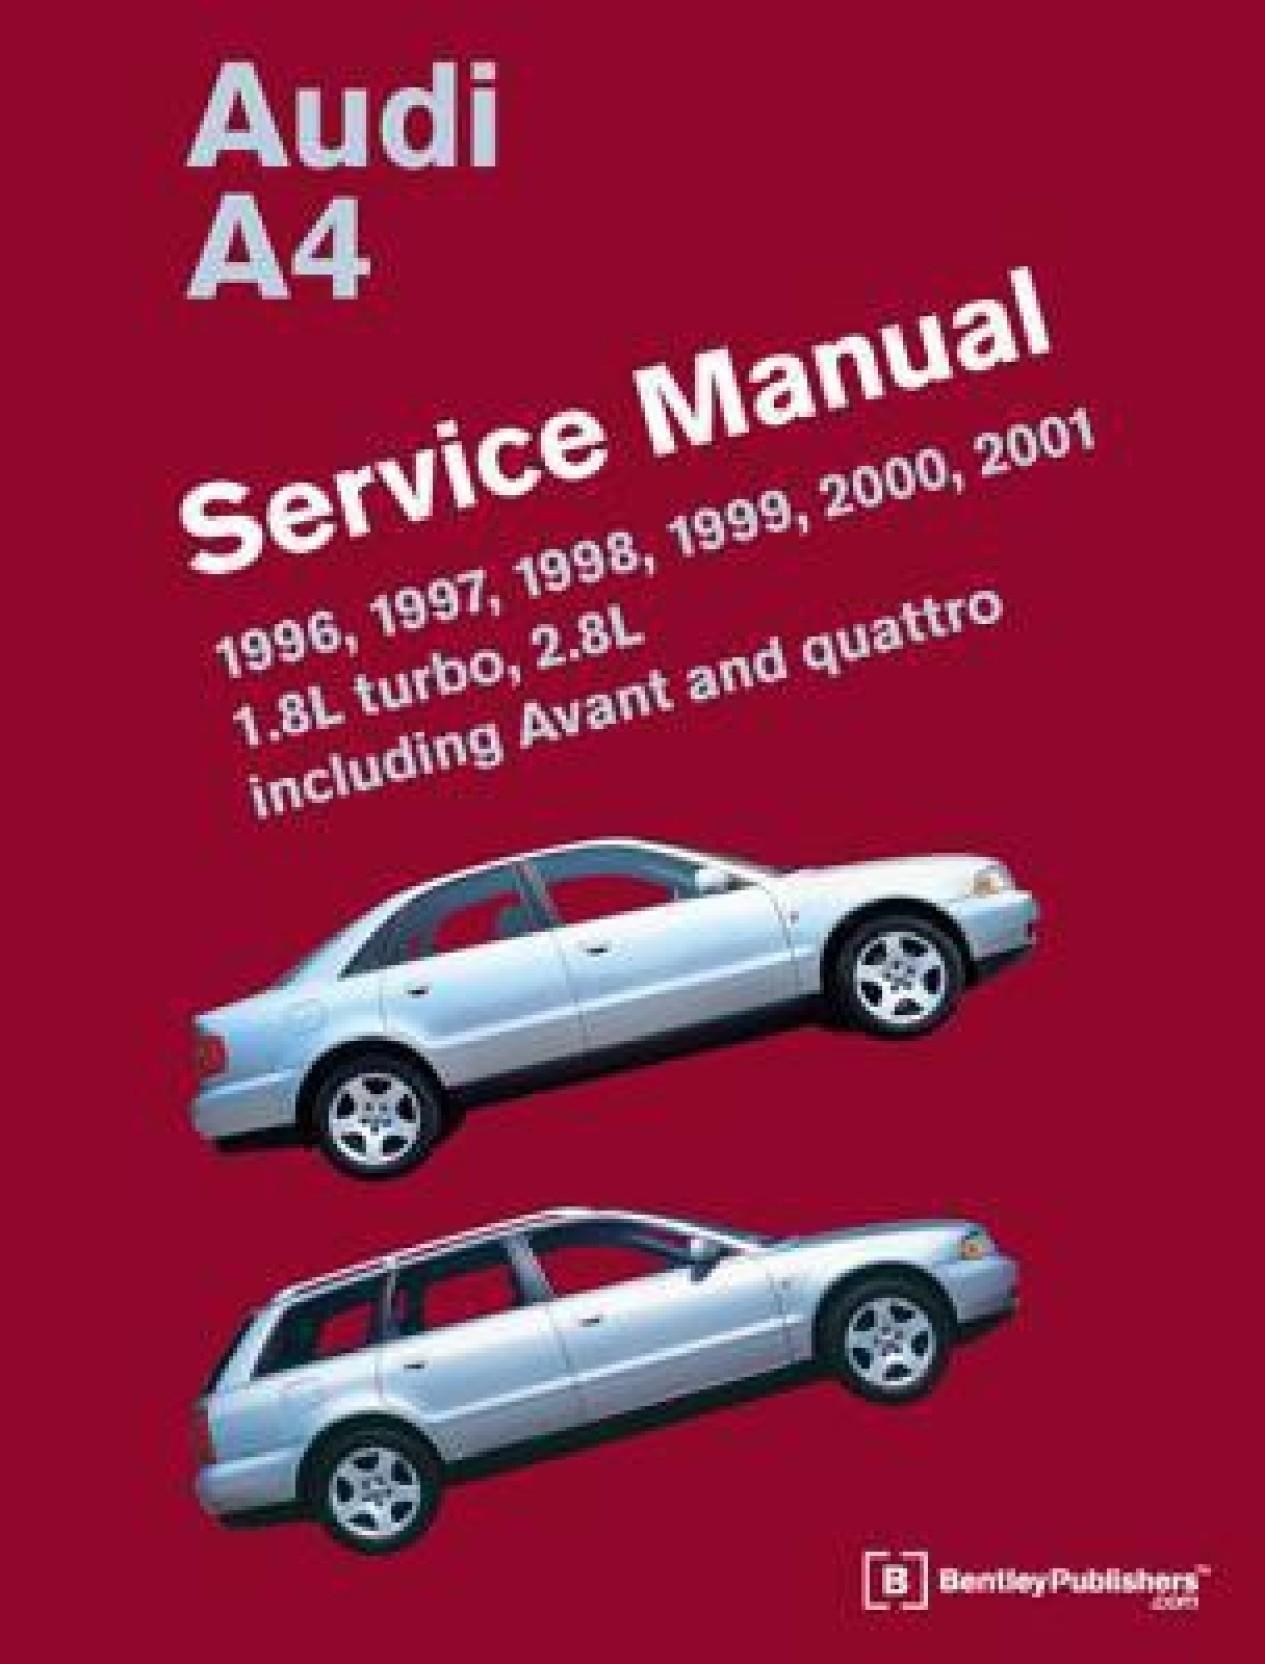 Audi A4 (B5) Service Manual: 1996, 1997, 1998, 1999,. Share